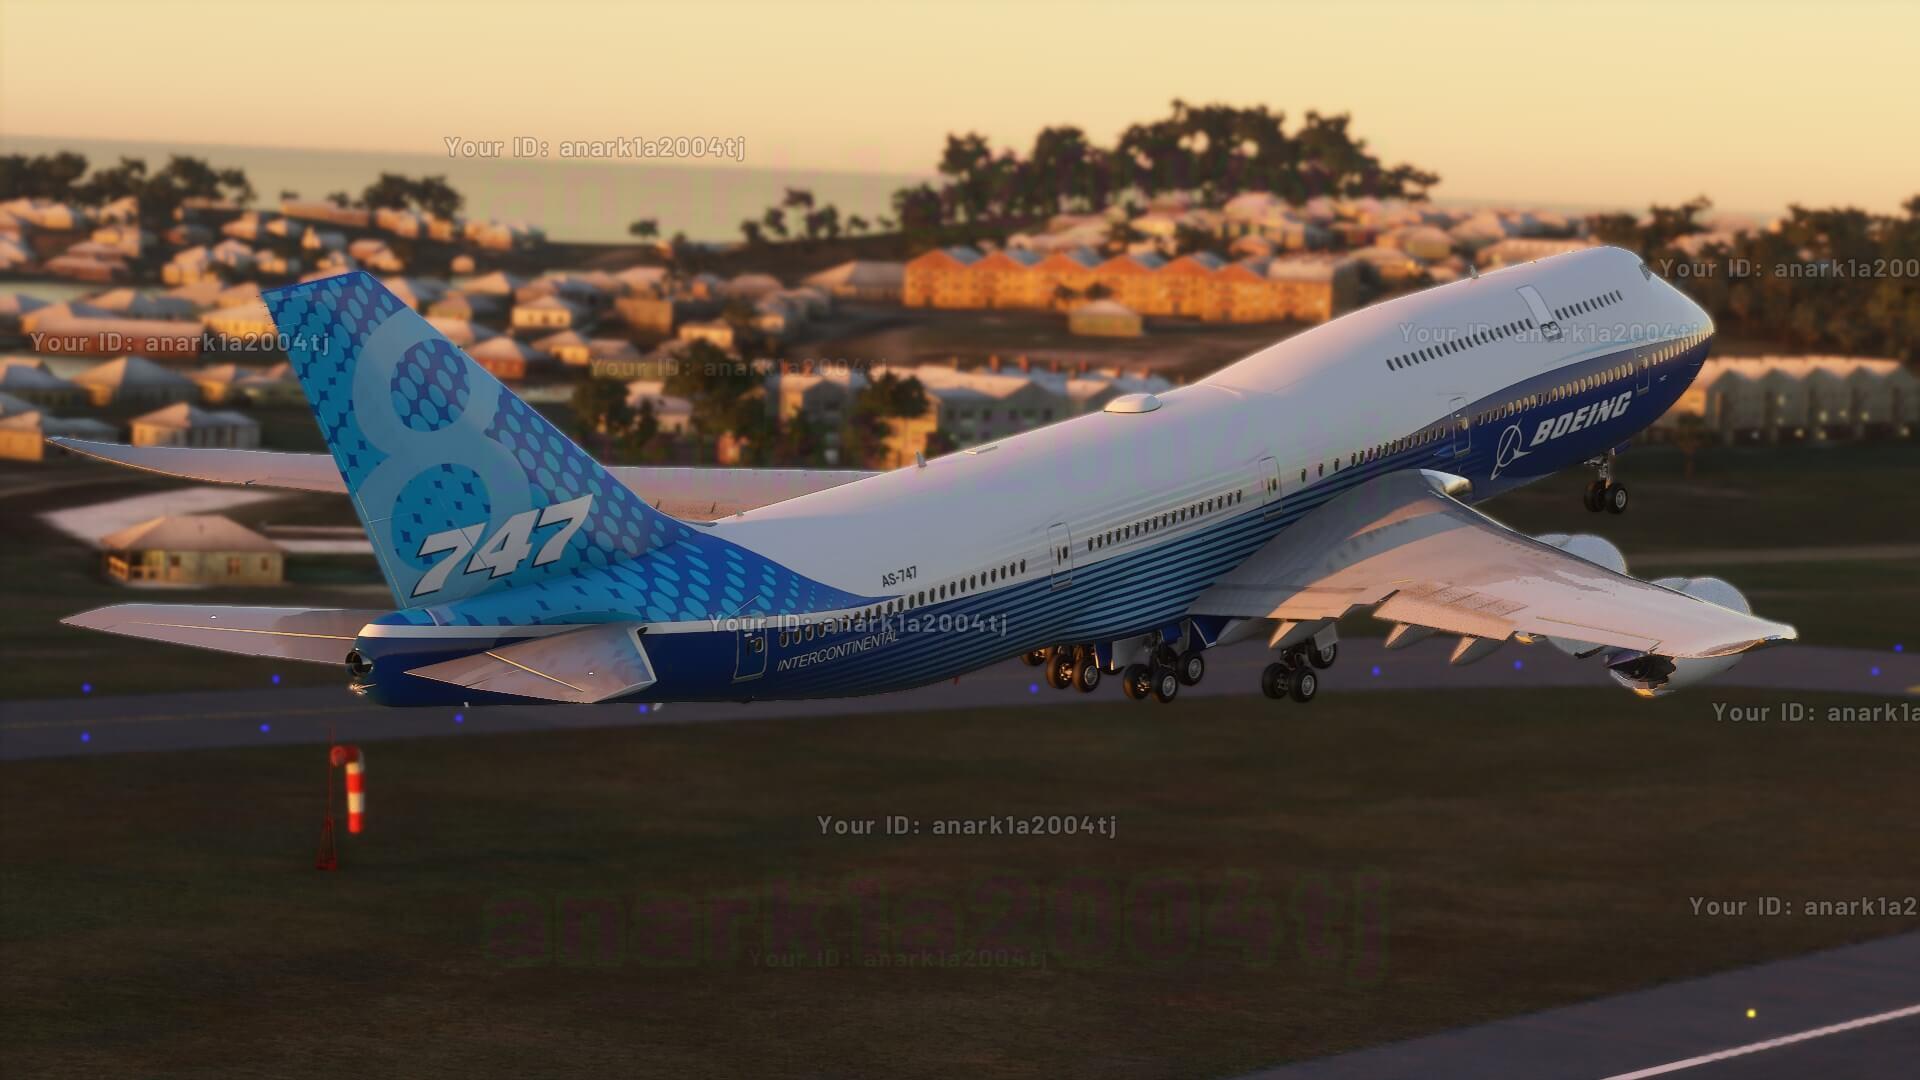 FlightSimulator_FOebusc6Qx.jpg